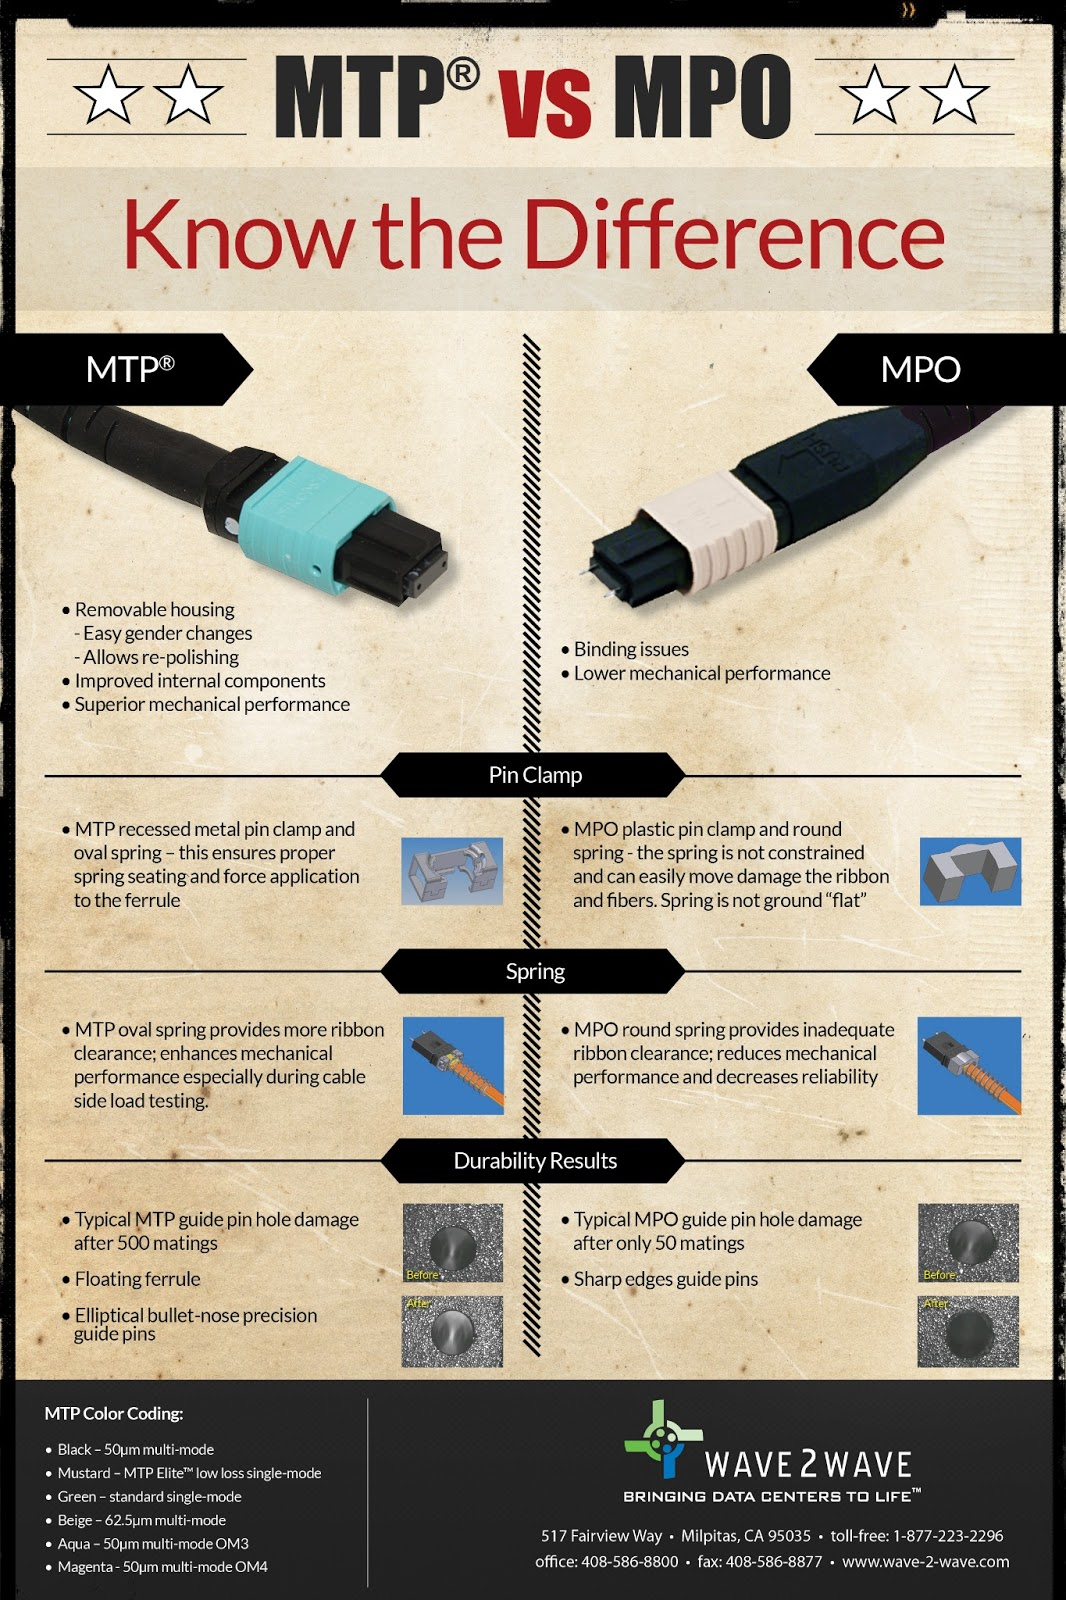 copper atom diagram wiring for 1999 jeep grand cherokee limited data center fiber & talk: mtp versus mpo